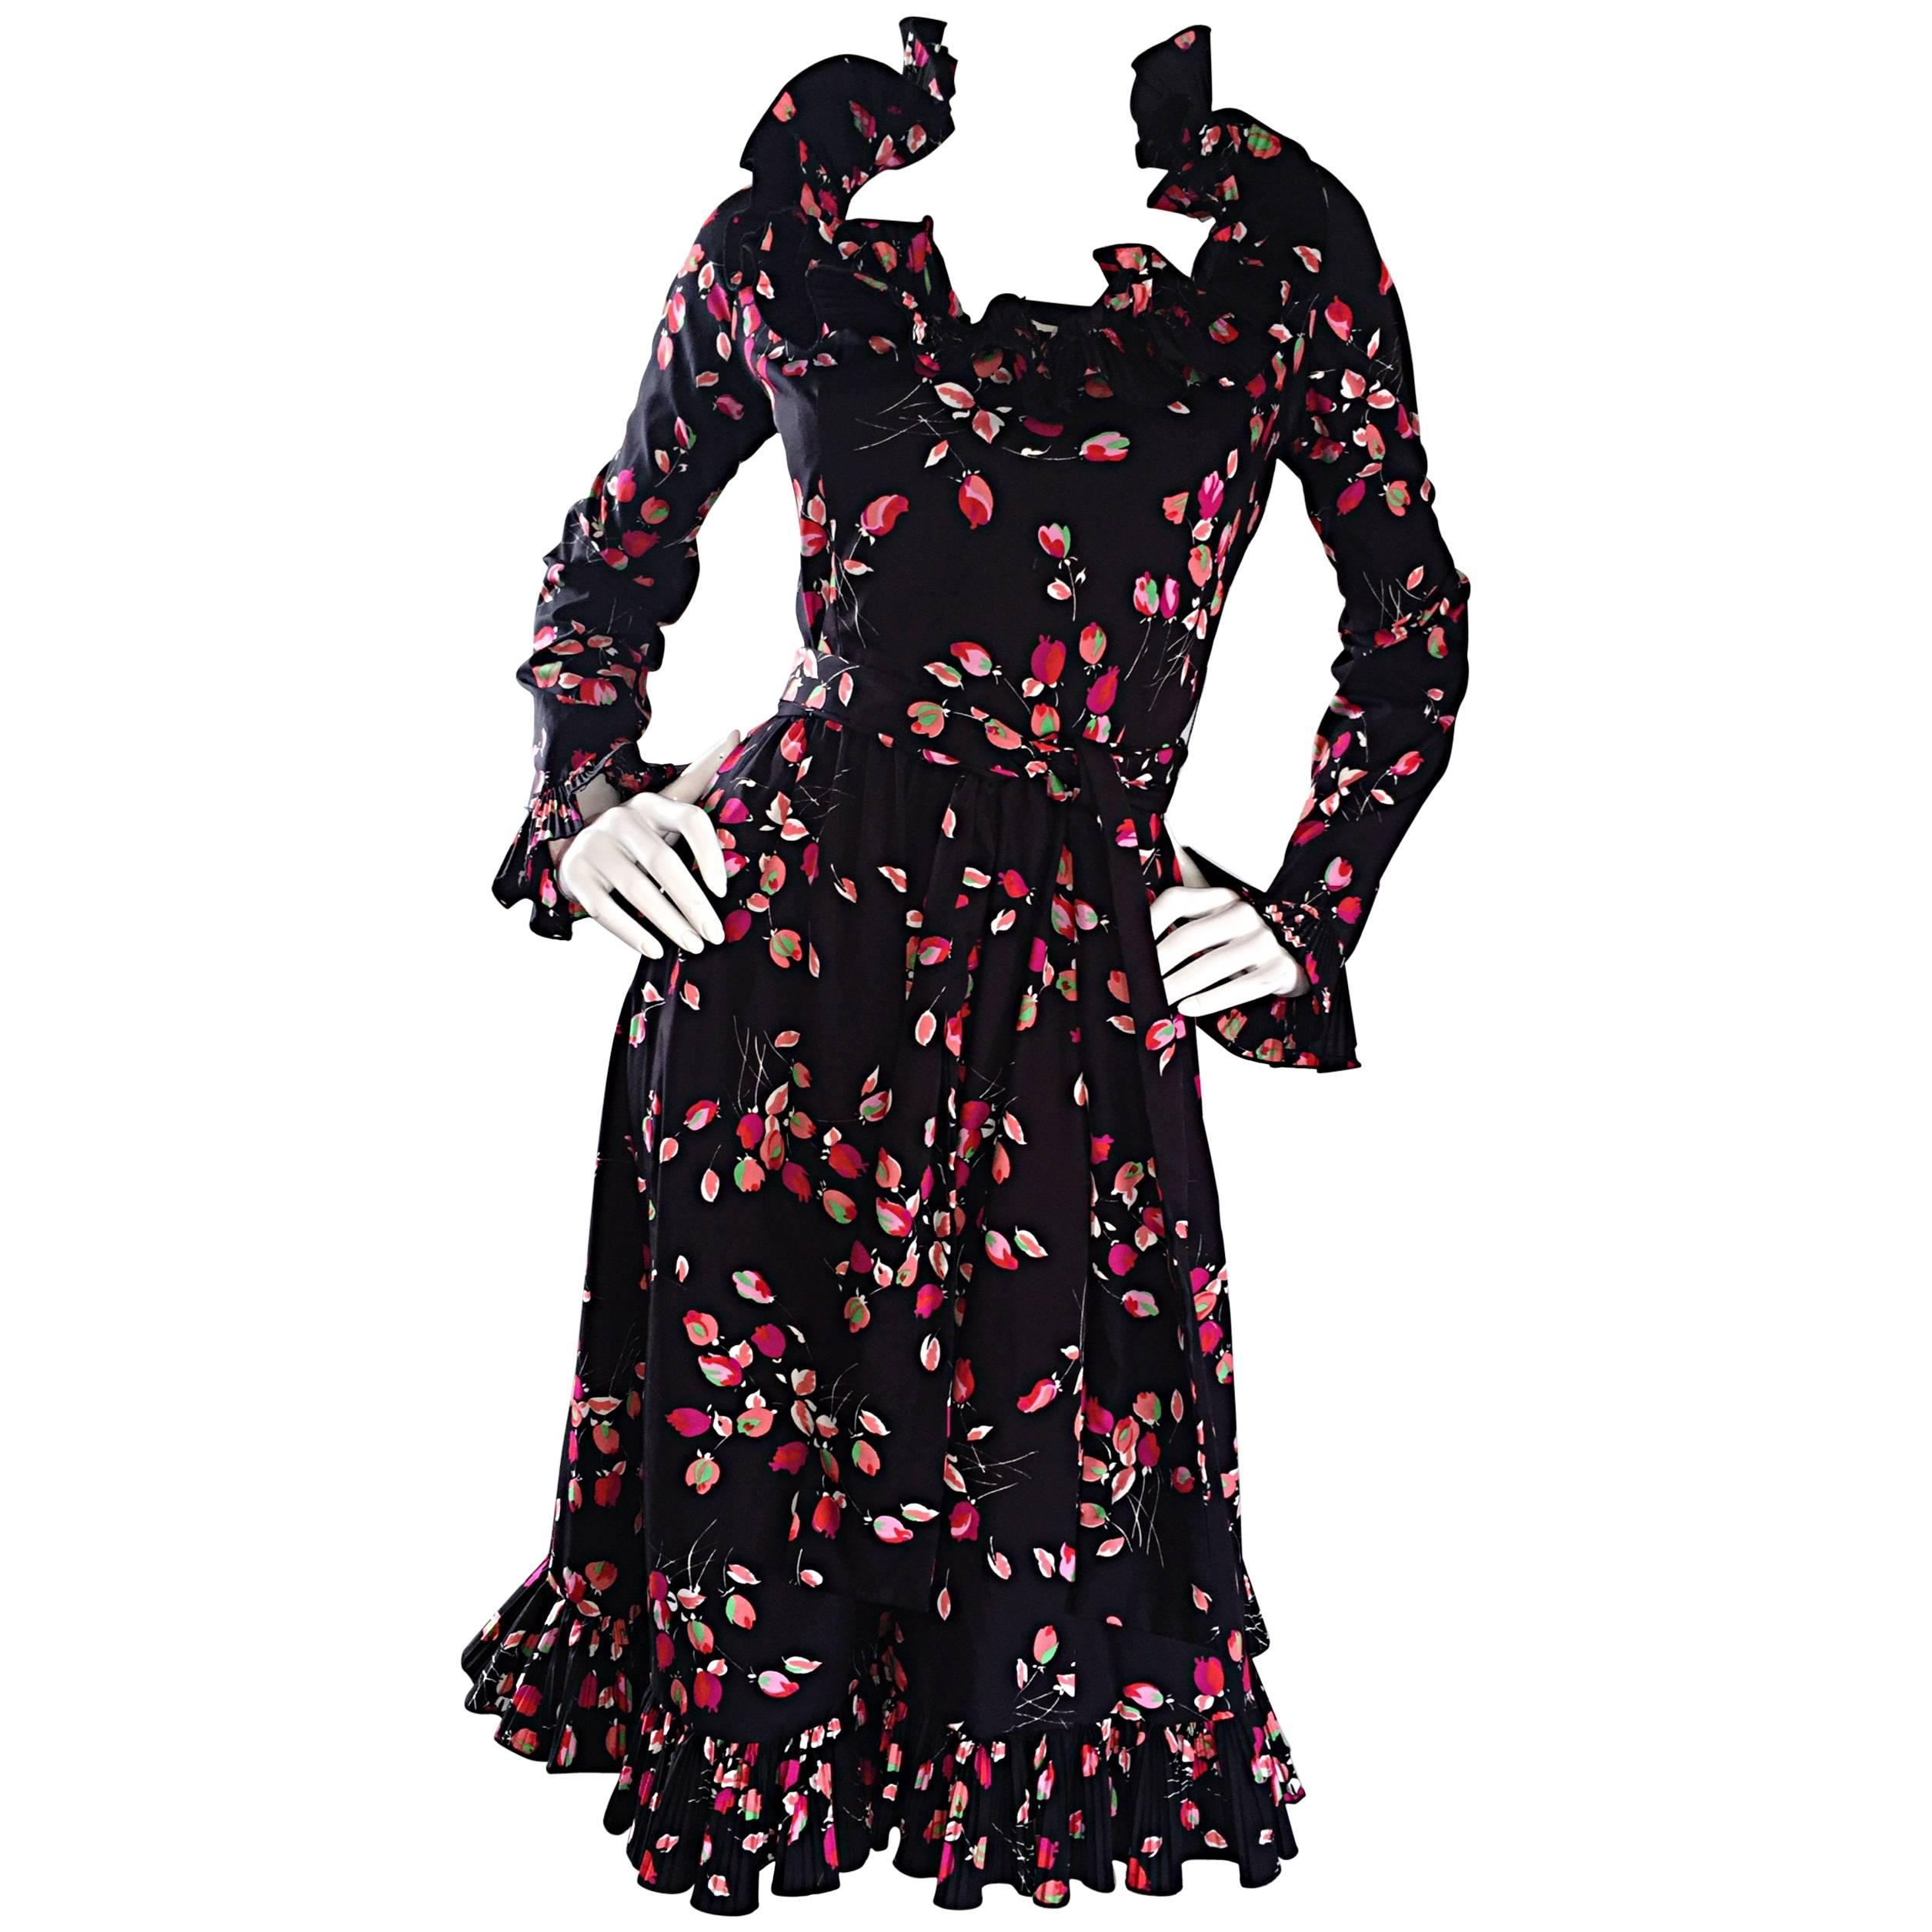 Vintage Victor Costa 1970s Black Tulip Print 70s Taffeta Belted Ruffle Dress